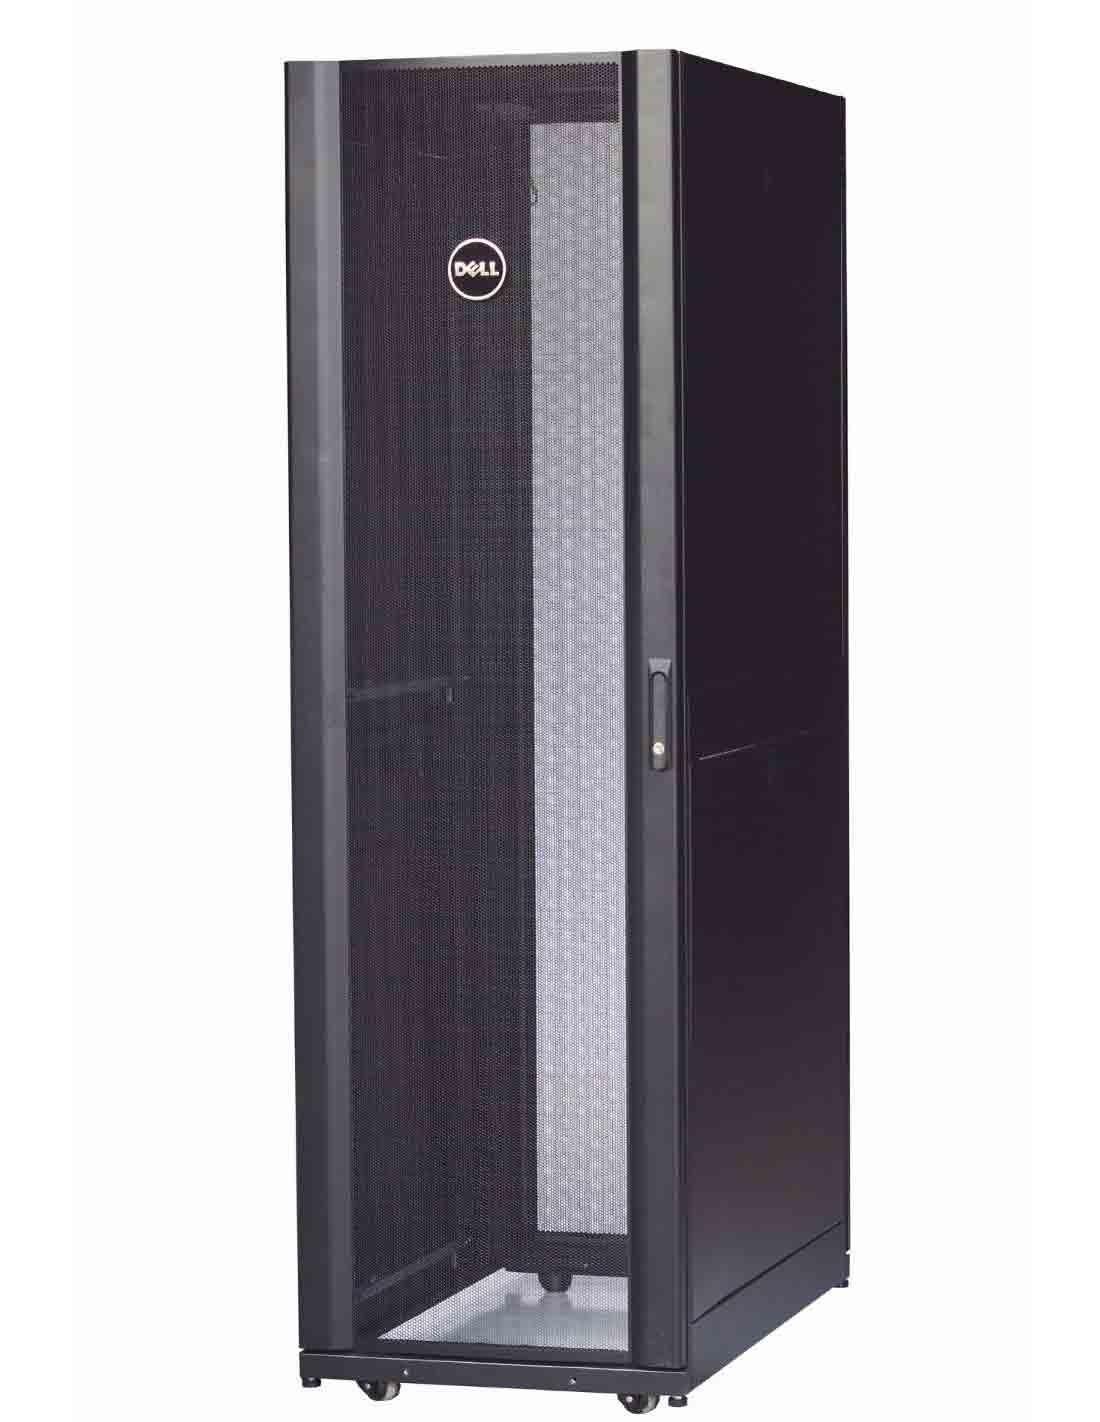 Dell AR3100 Netshelter SX 42U Rack at a cheap price in Dubai server store